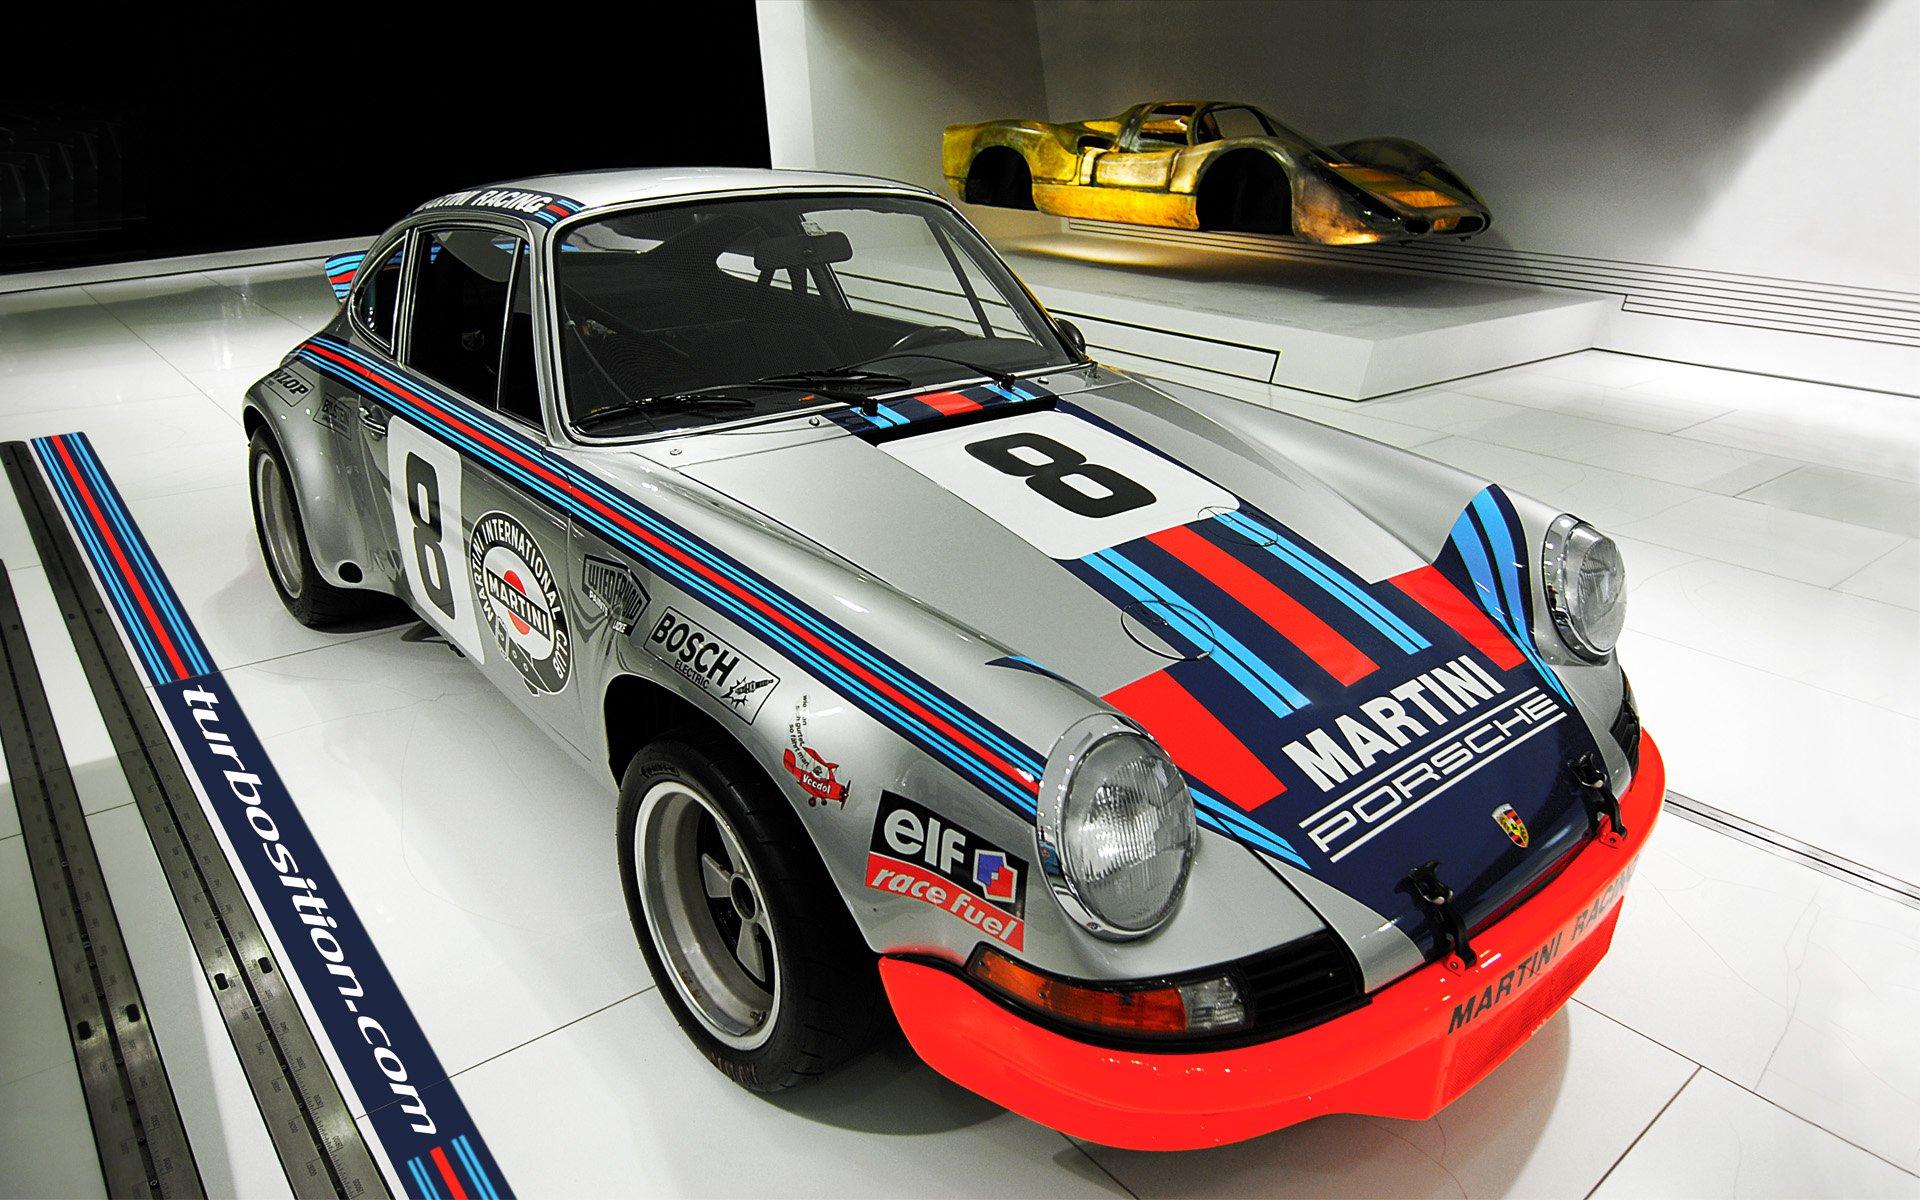 Porsche 911 Carrera Rsr 1973 Porsche Of The Month 2015